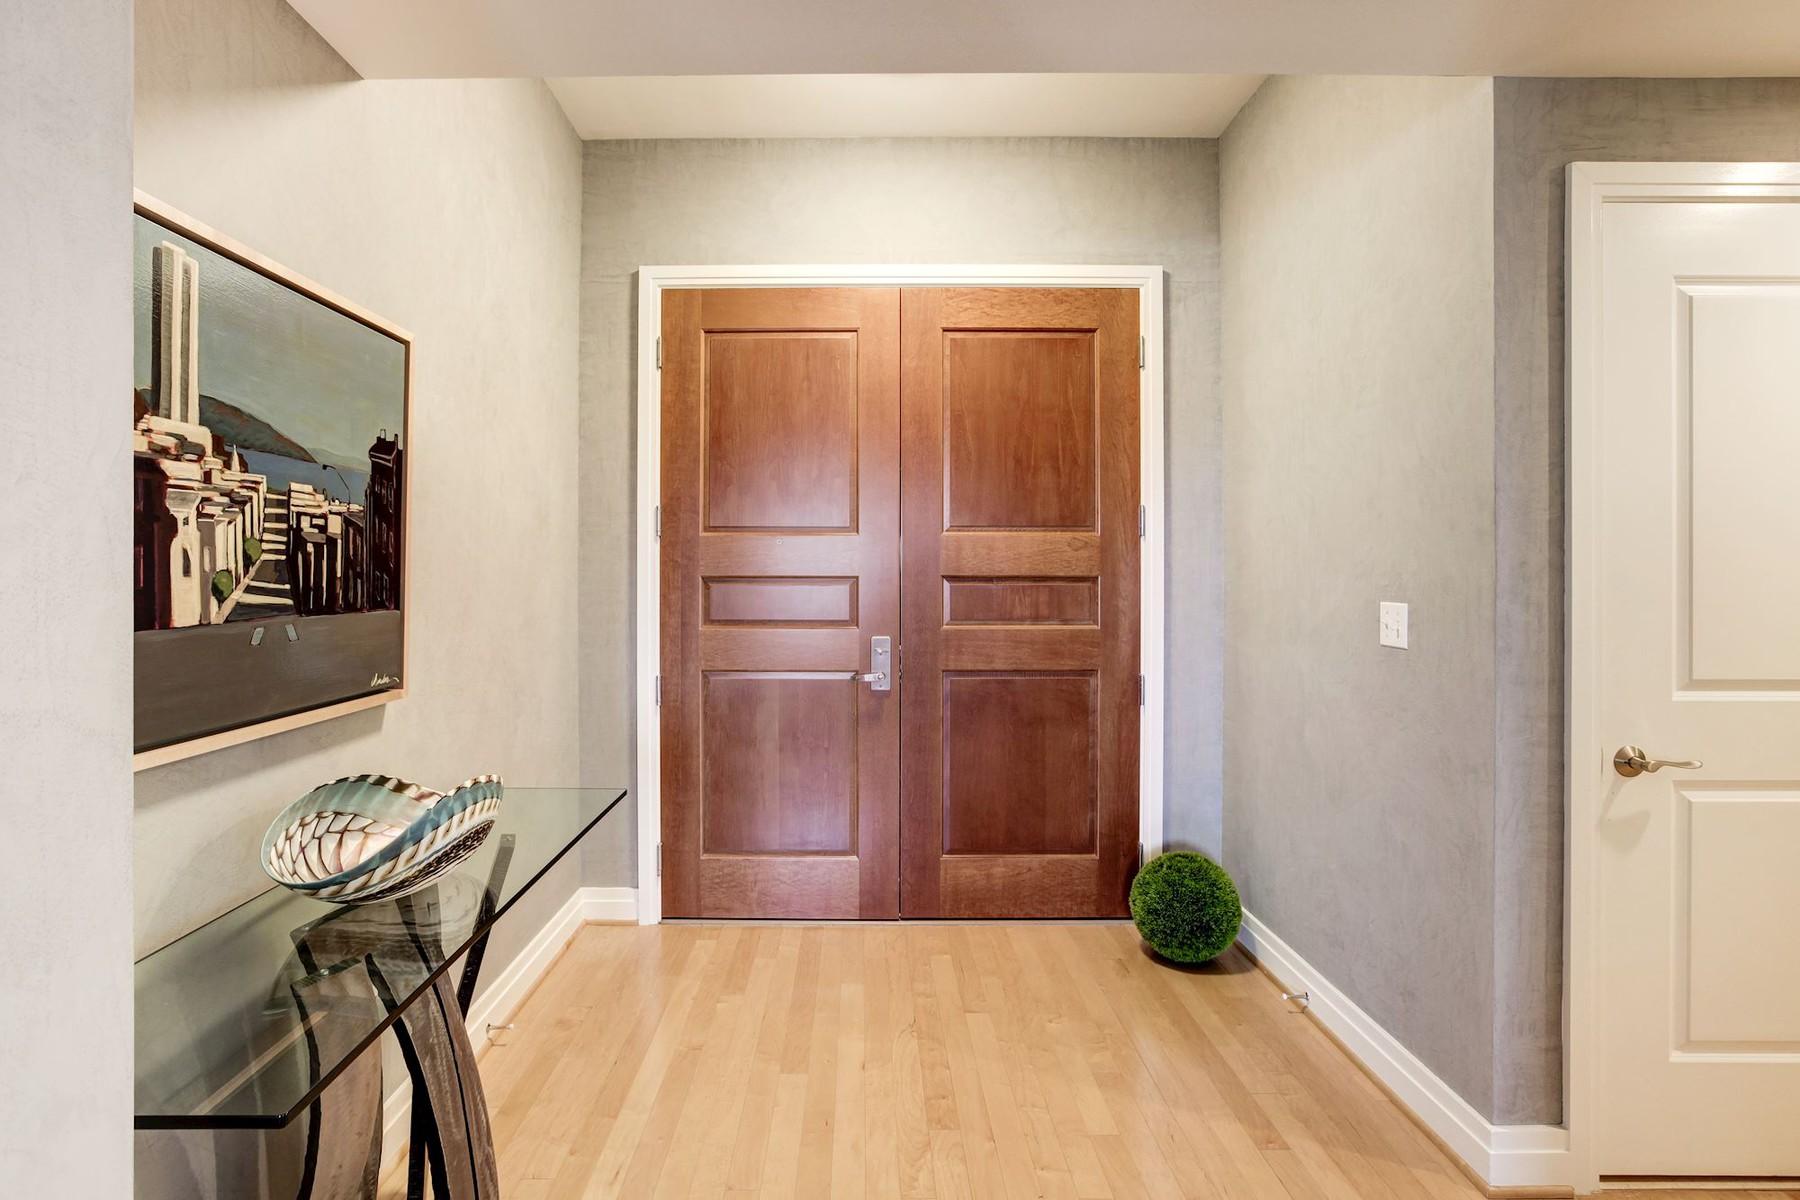 Nhà chung cư vì Bán tại One Park Crest Condo 8220 Crestwood Heights Dr 1802 McLean, Virginia, 22102 Hoa Kỳ